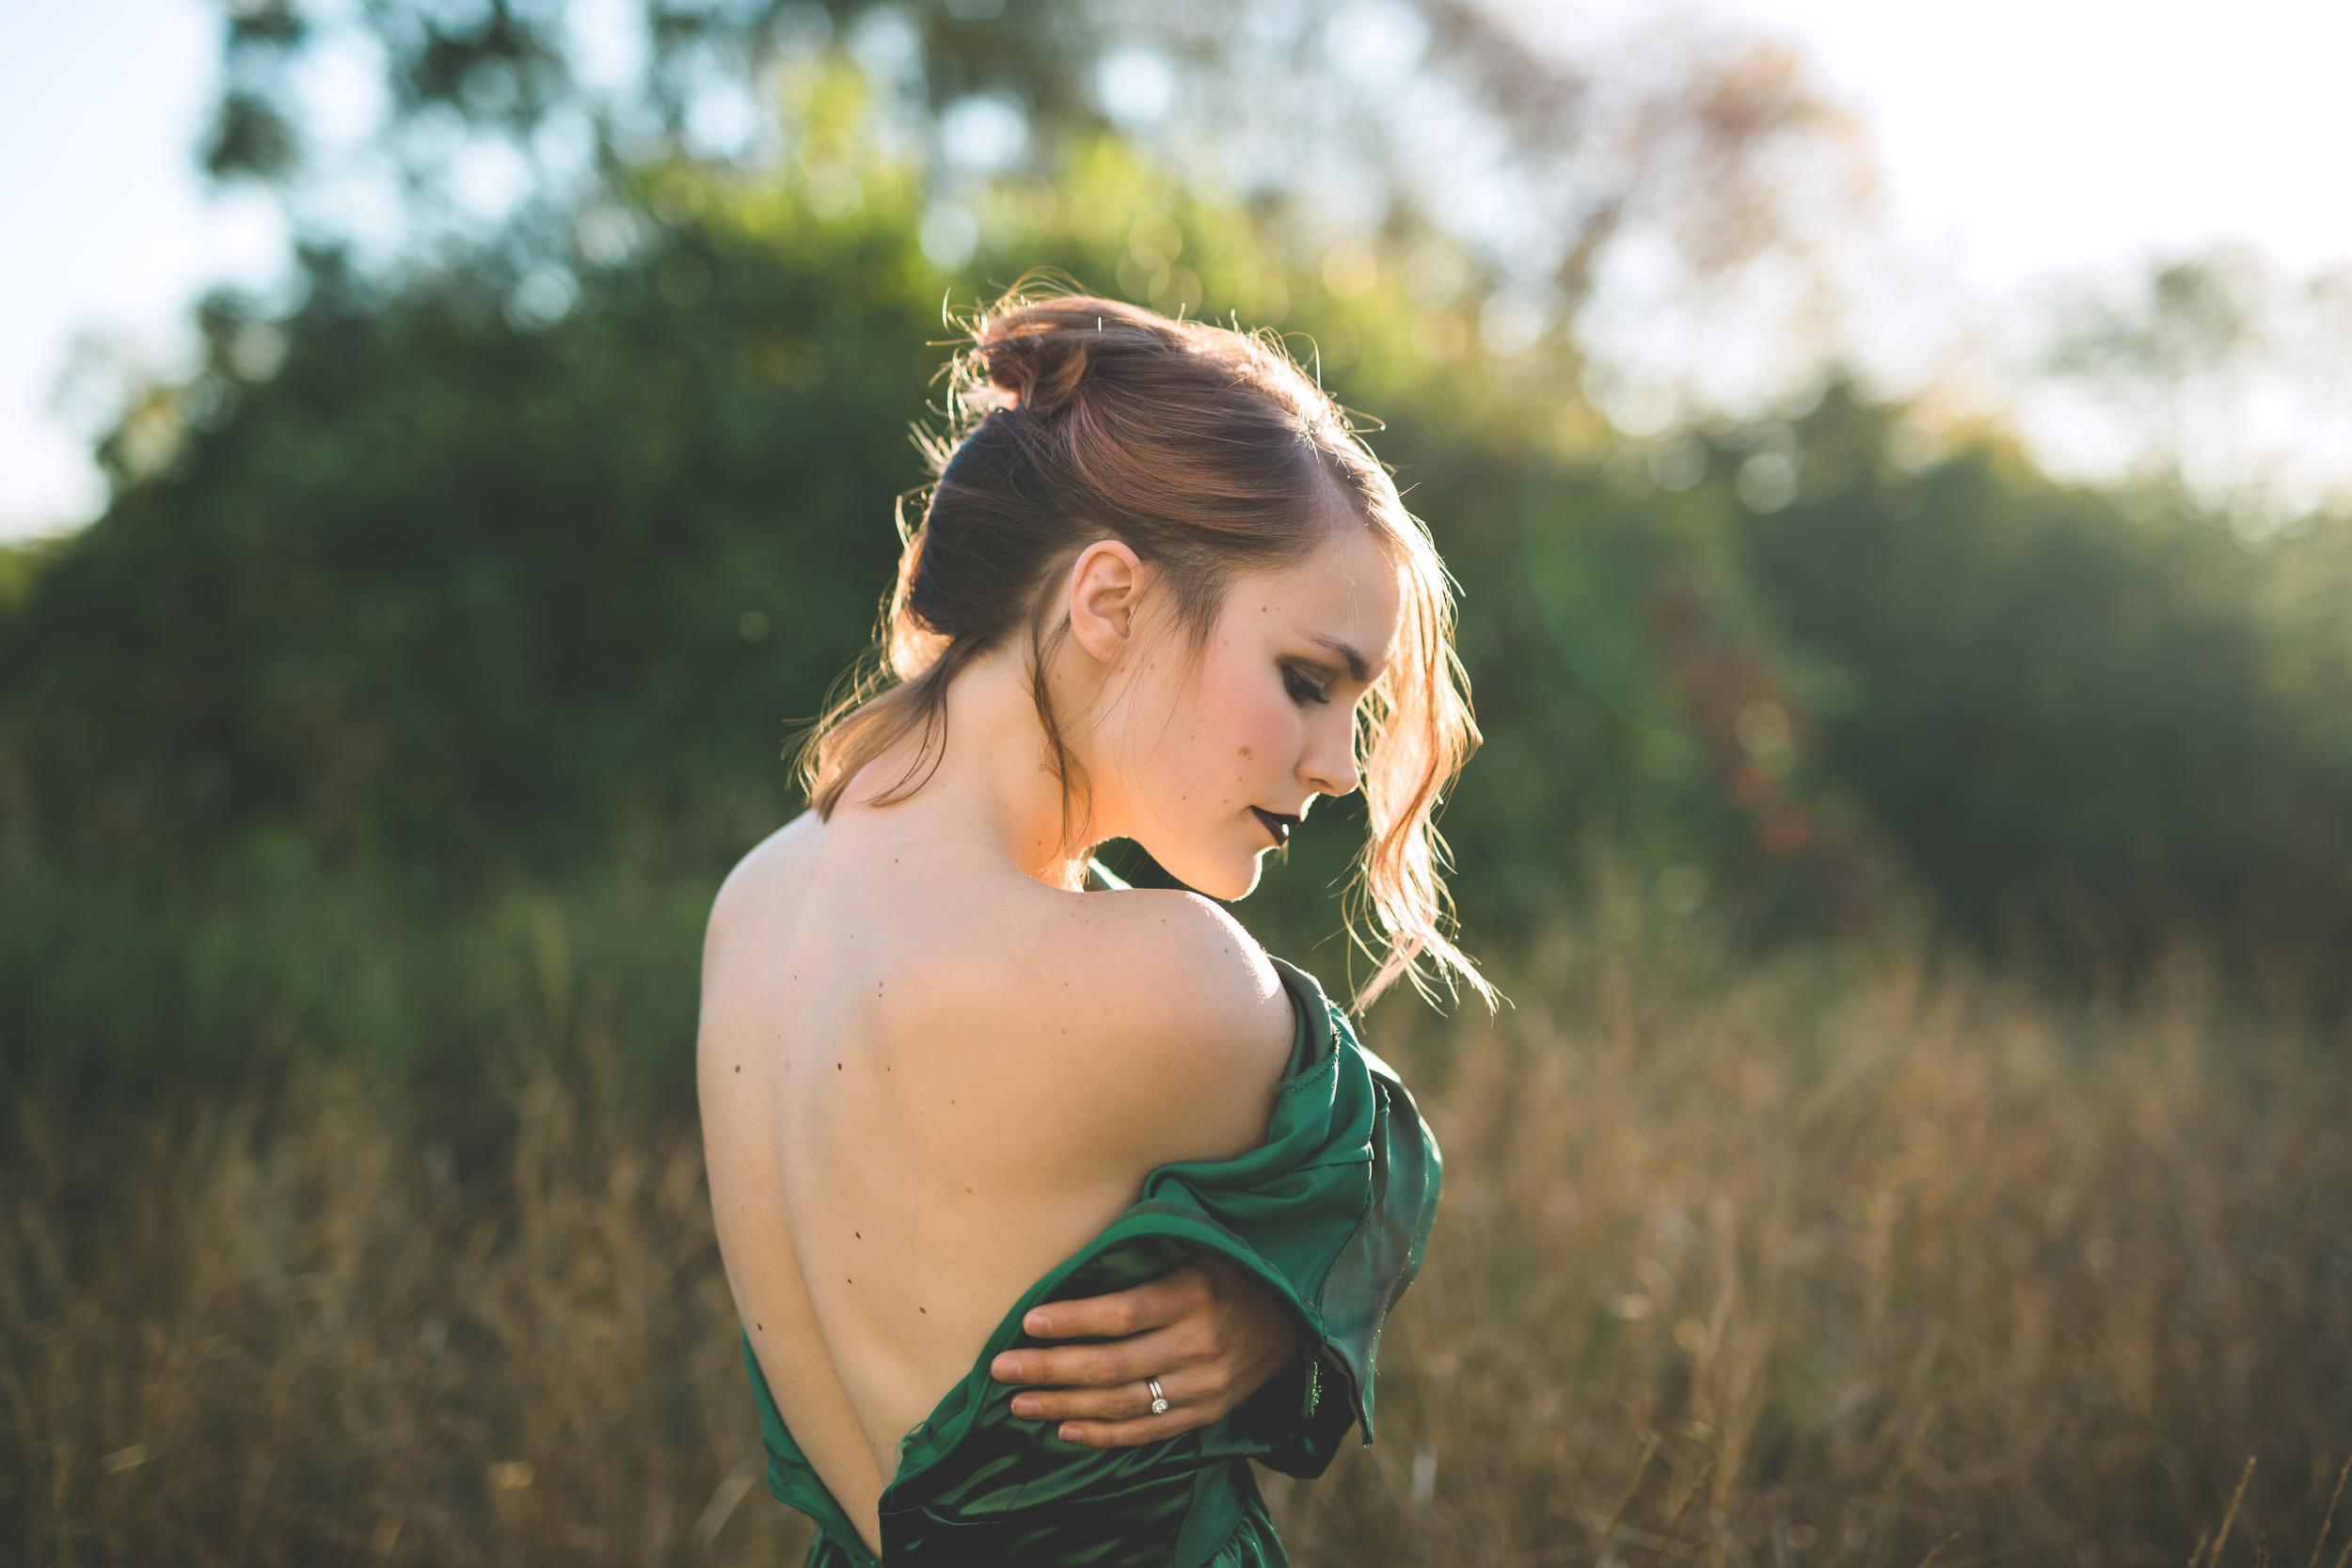 Jennifer Picard Photography, Sunshine Coast and Vancouver BC portrait photographer